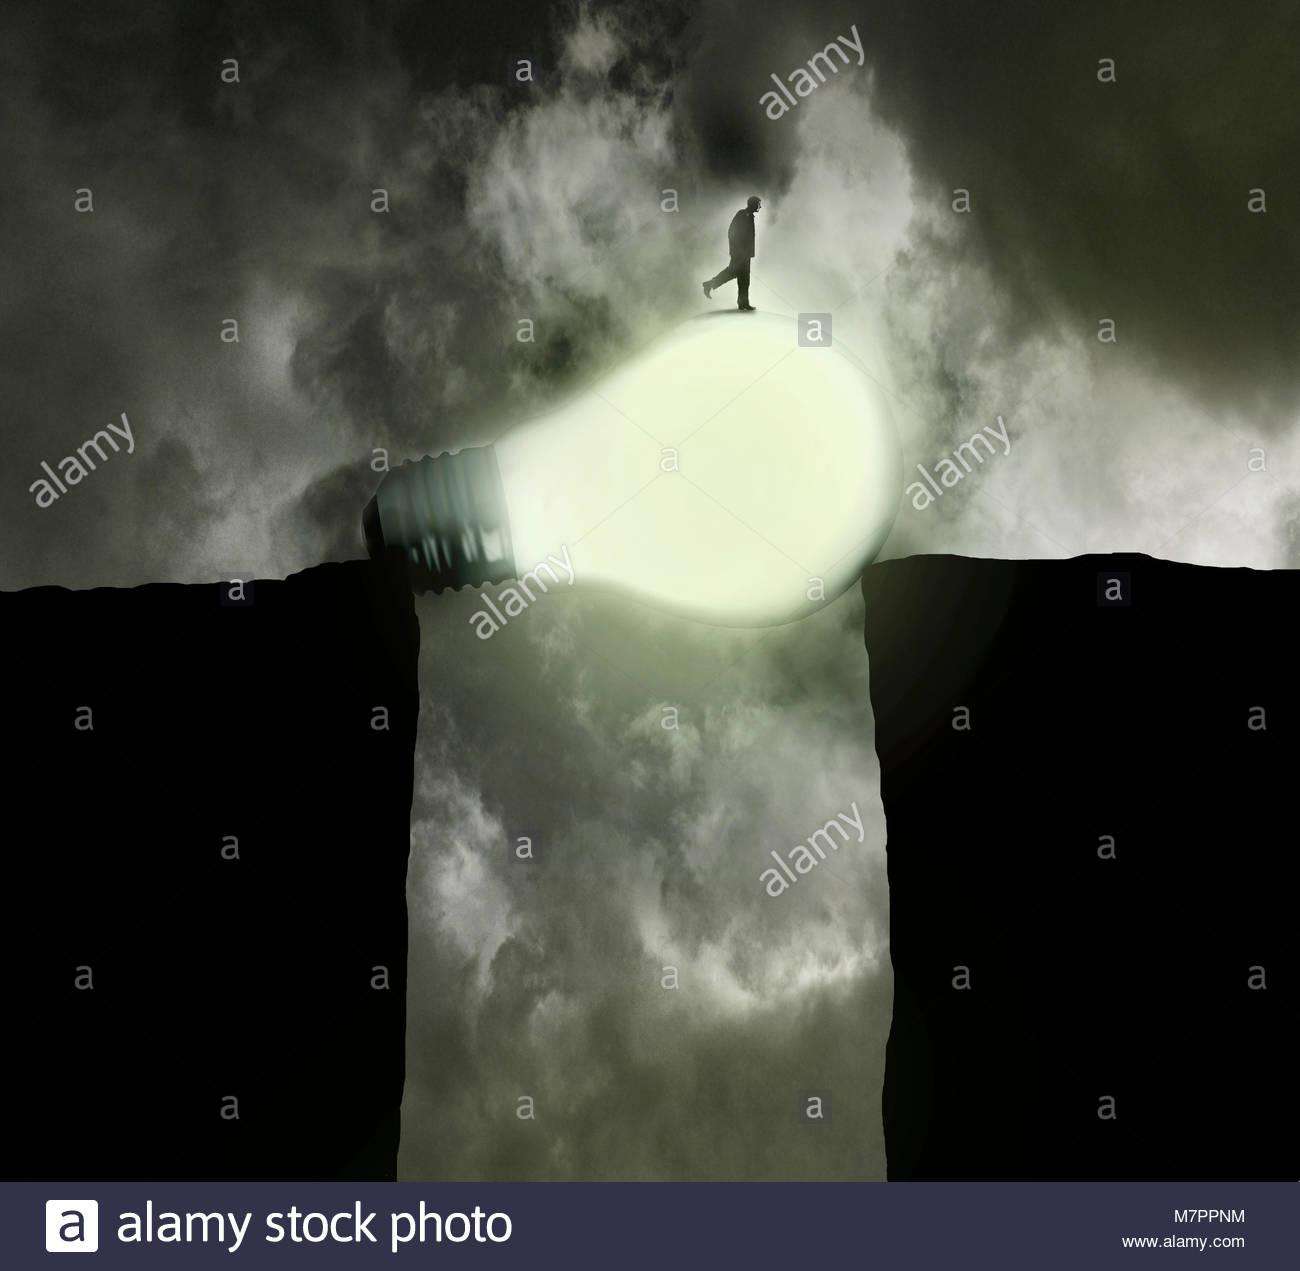 Businessman bridging the gap with illuminated light bulb - Stock Image